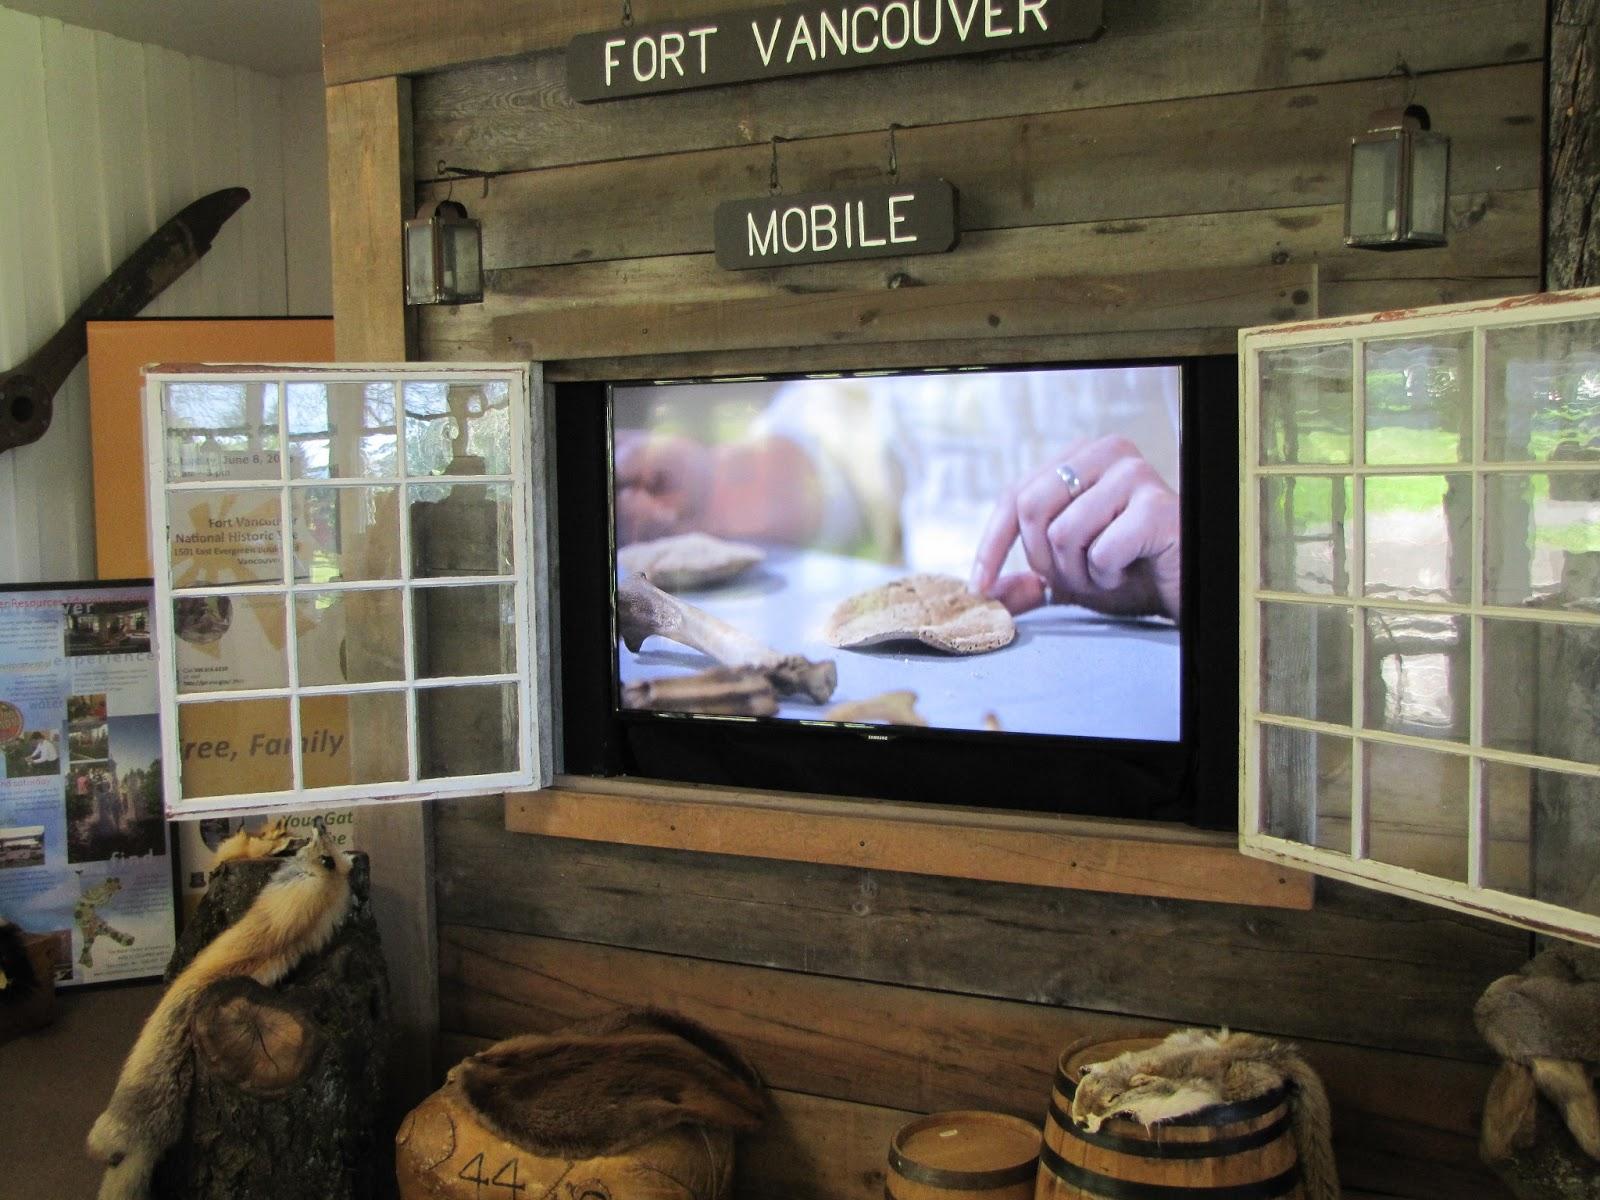 Fort Vancouver Mobileu0027s Permanent Exhibit Debuts!